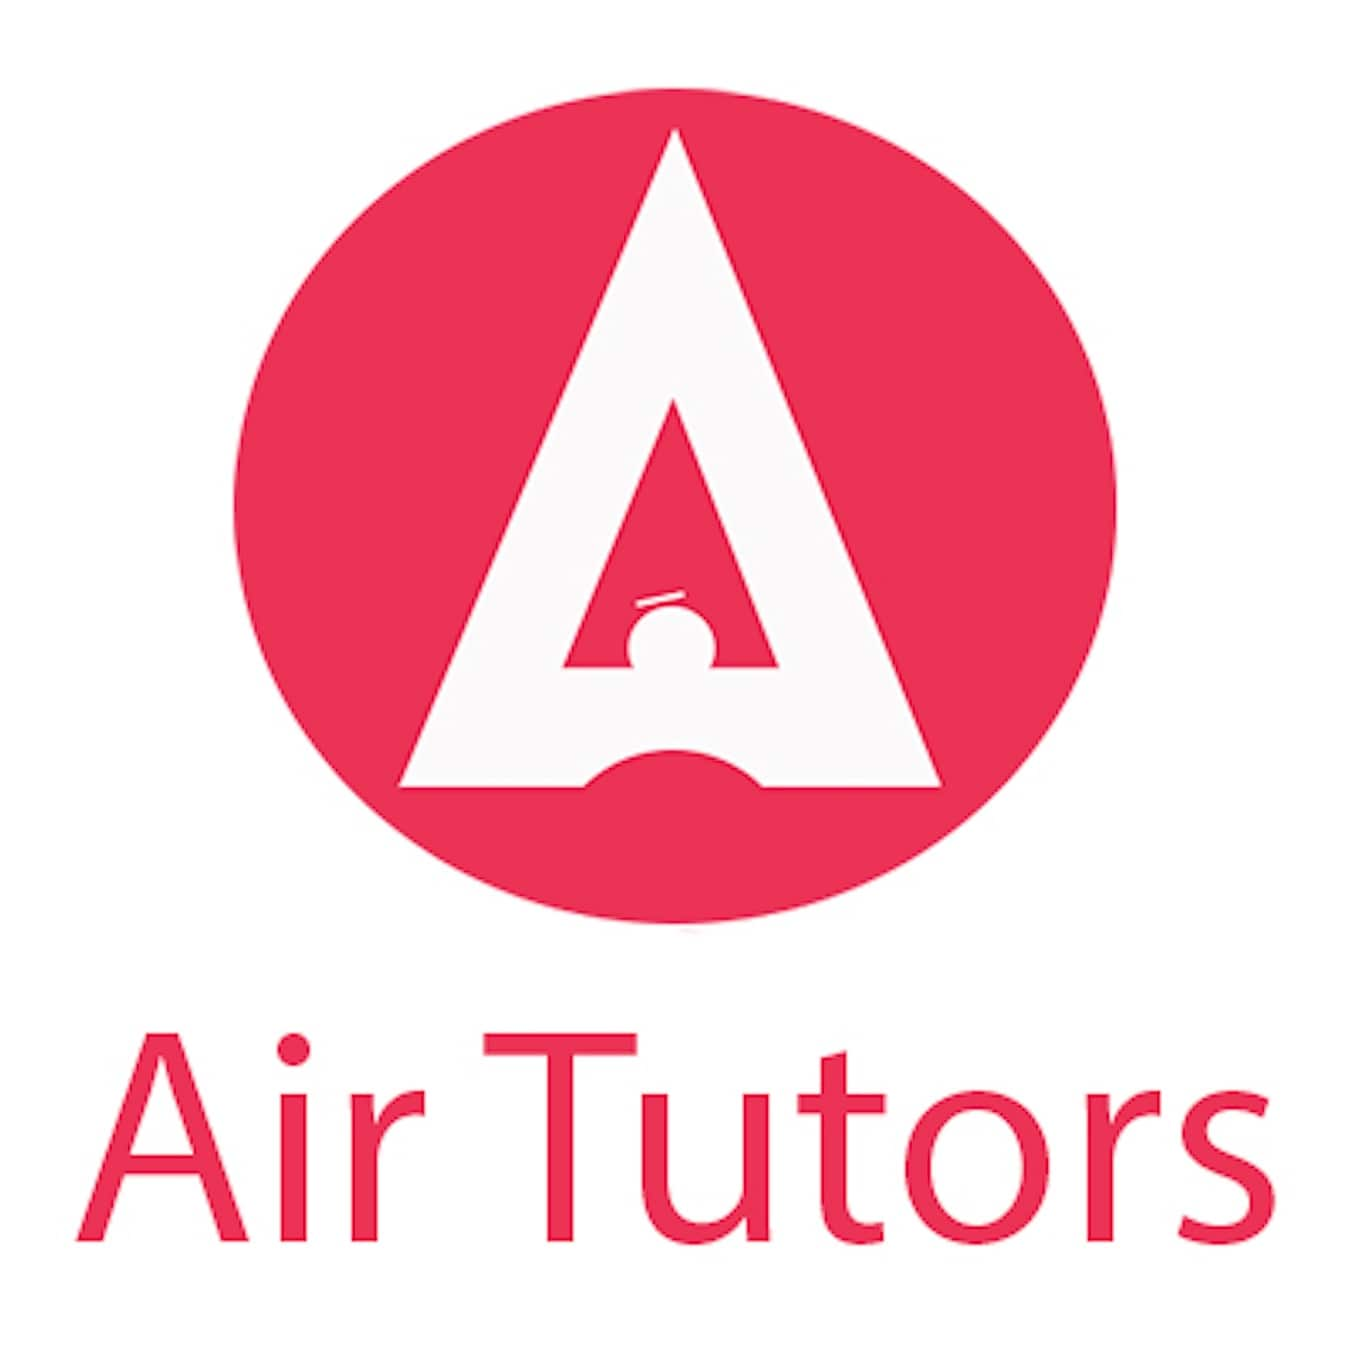 Air Tutors